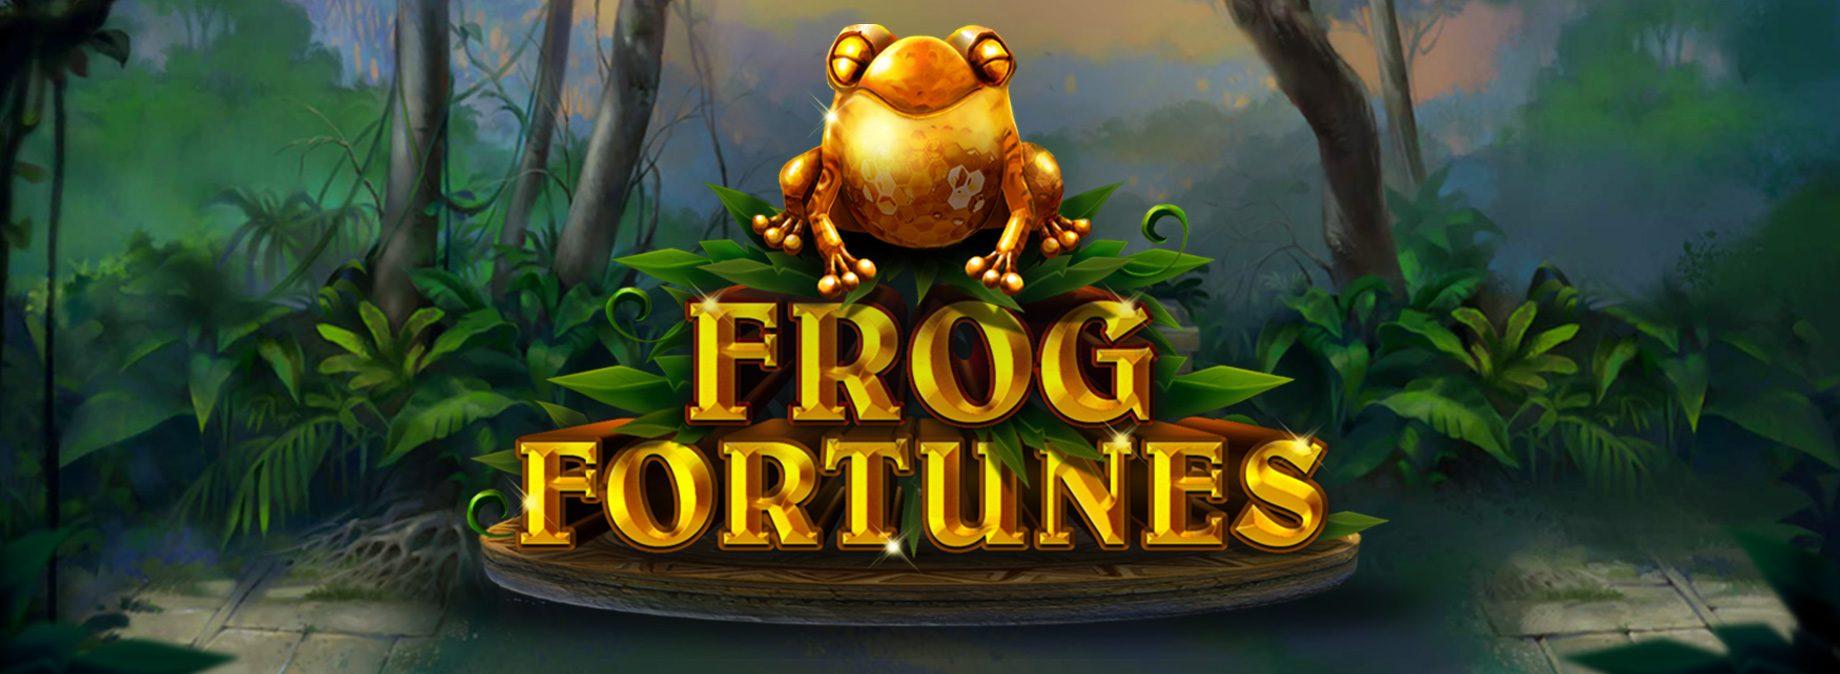 FrogFortunesSlot